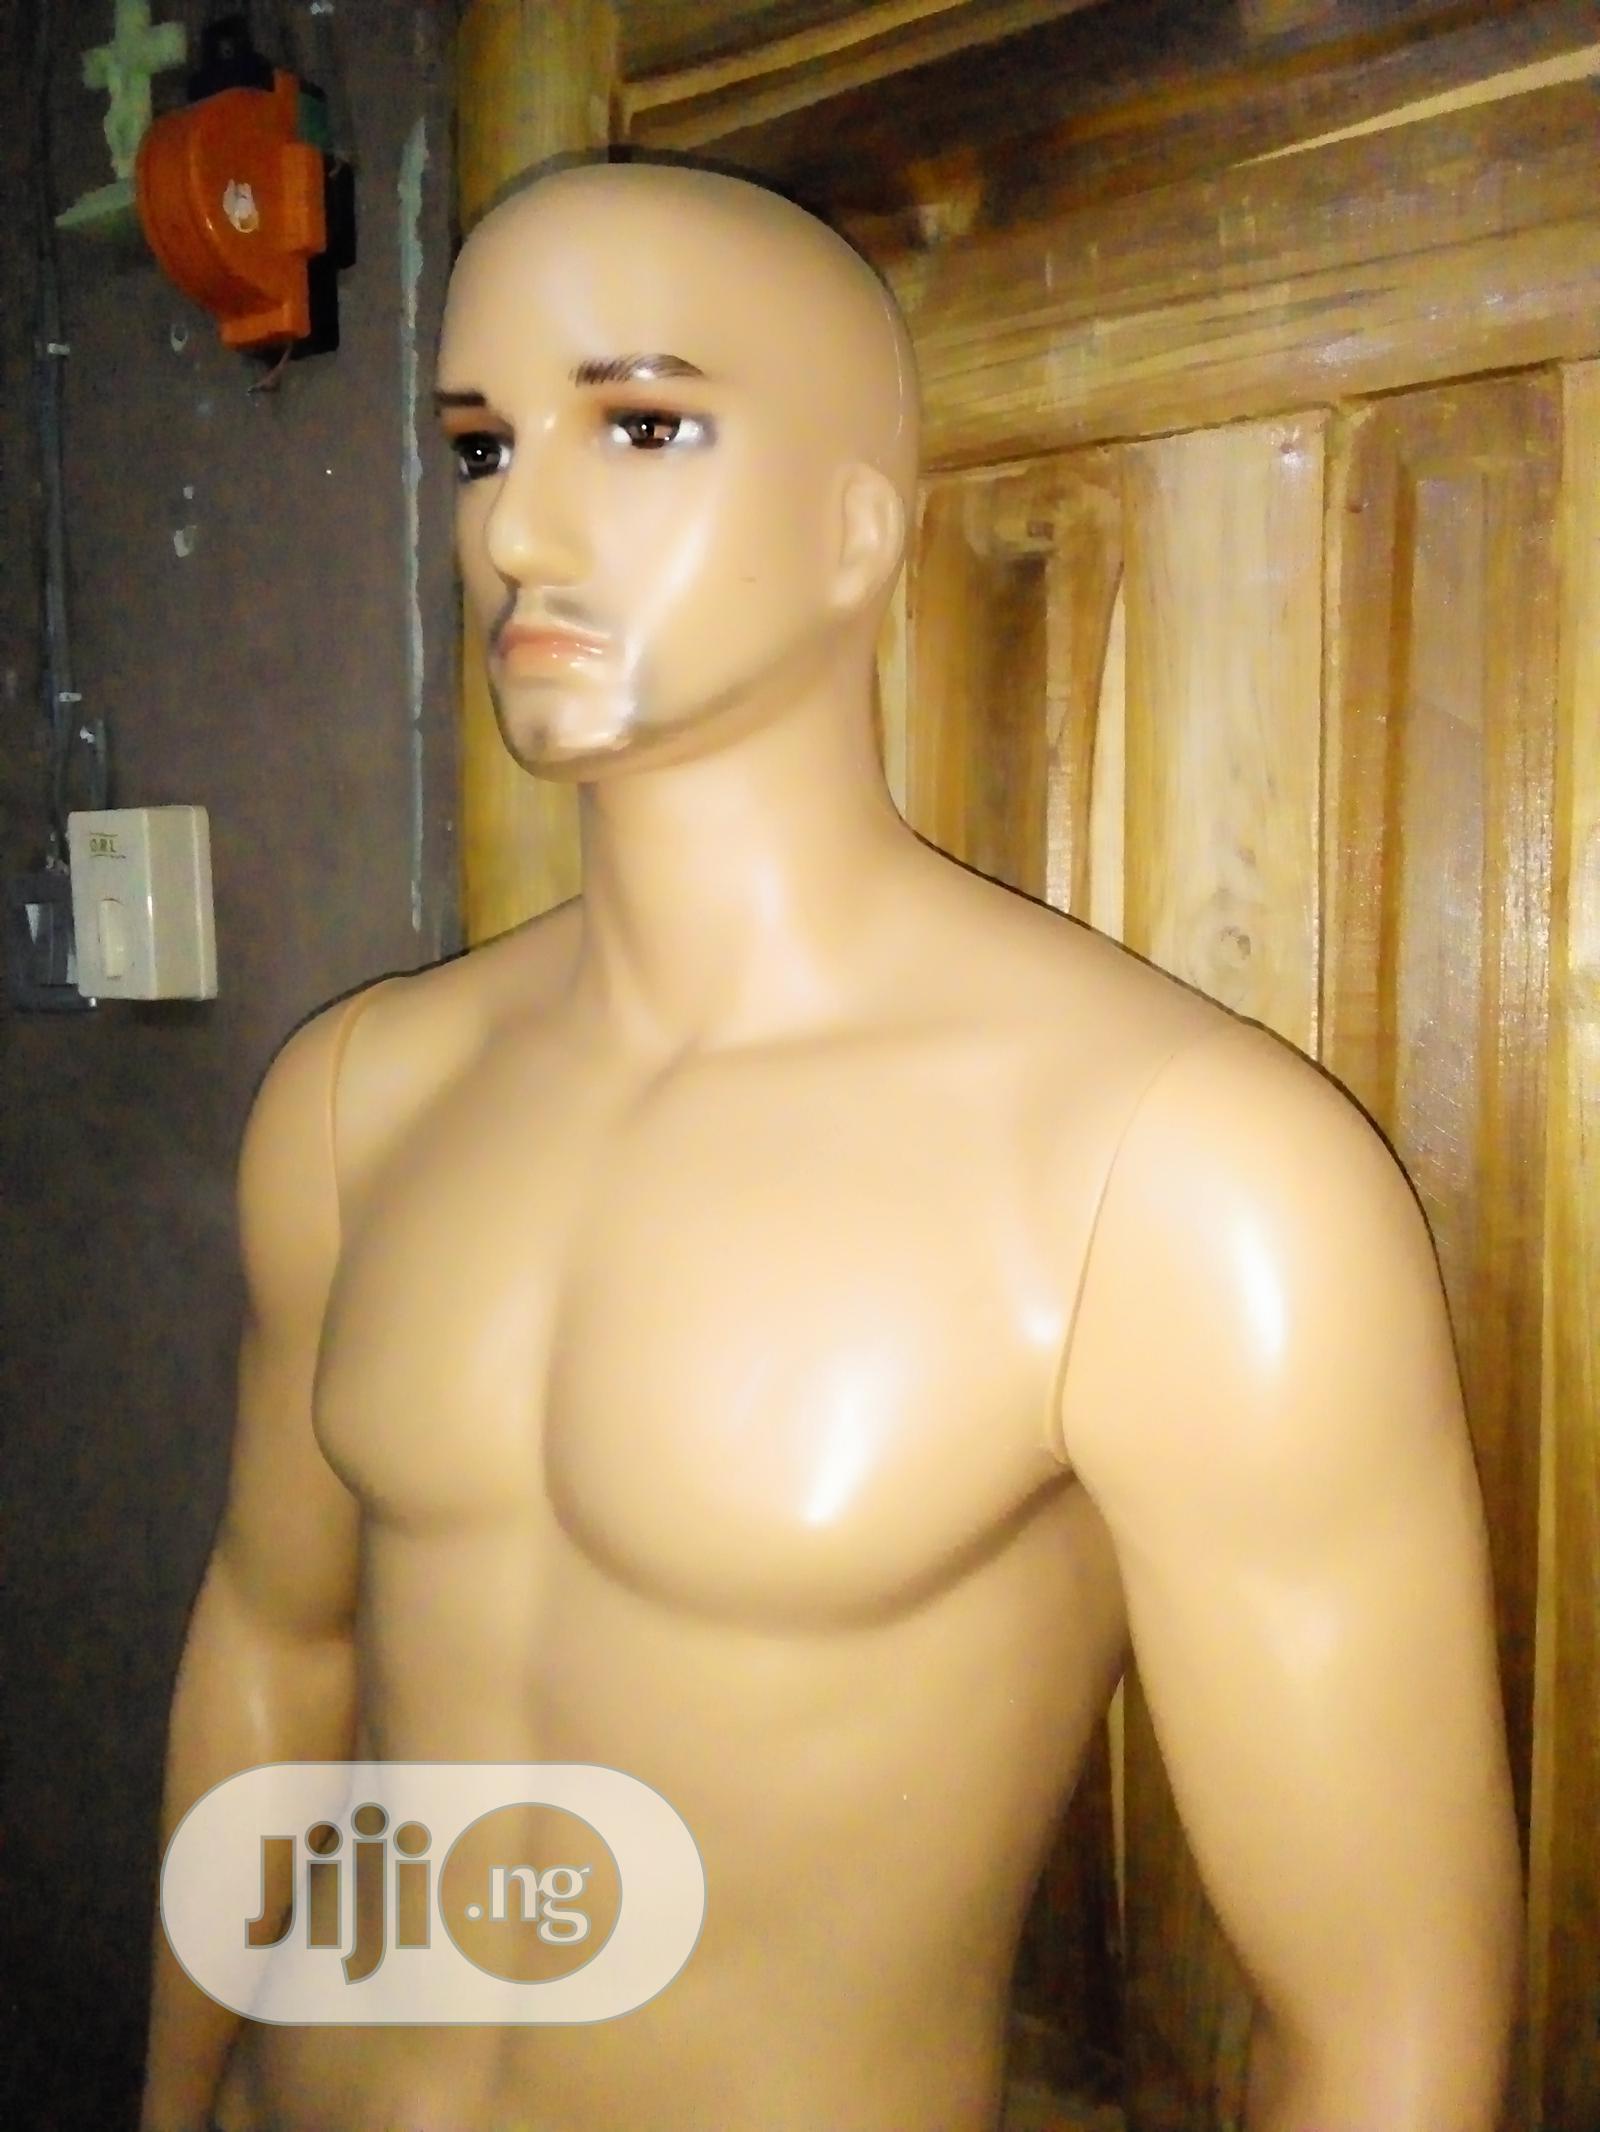 Archive: Male Plastic Mannequin